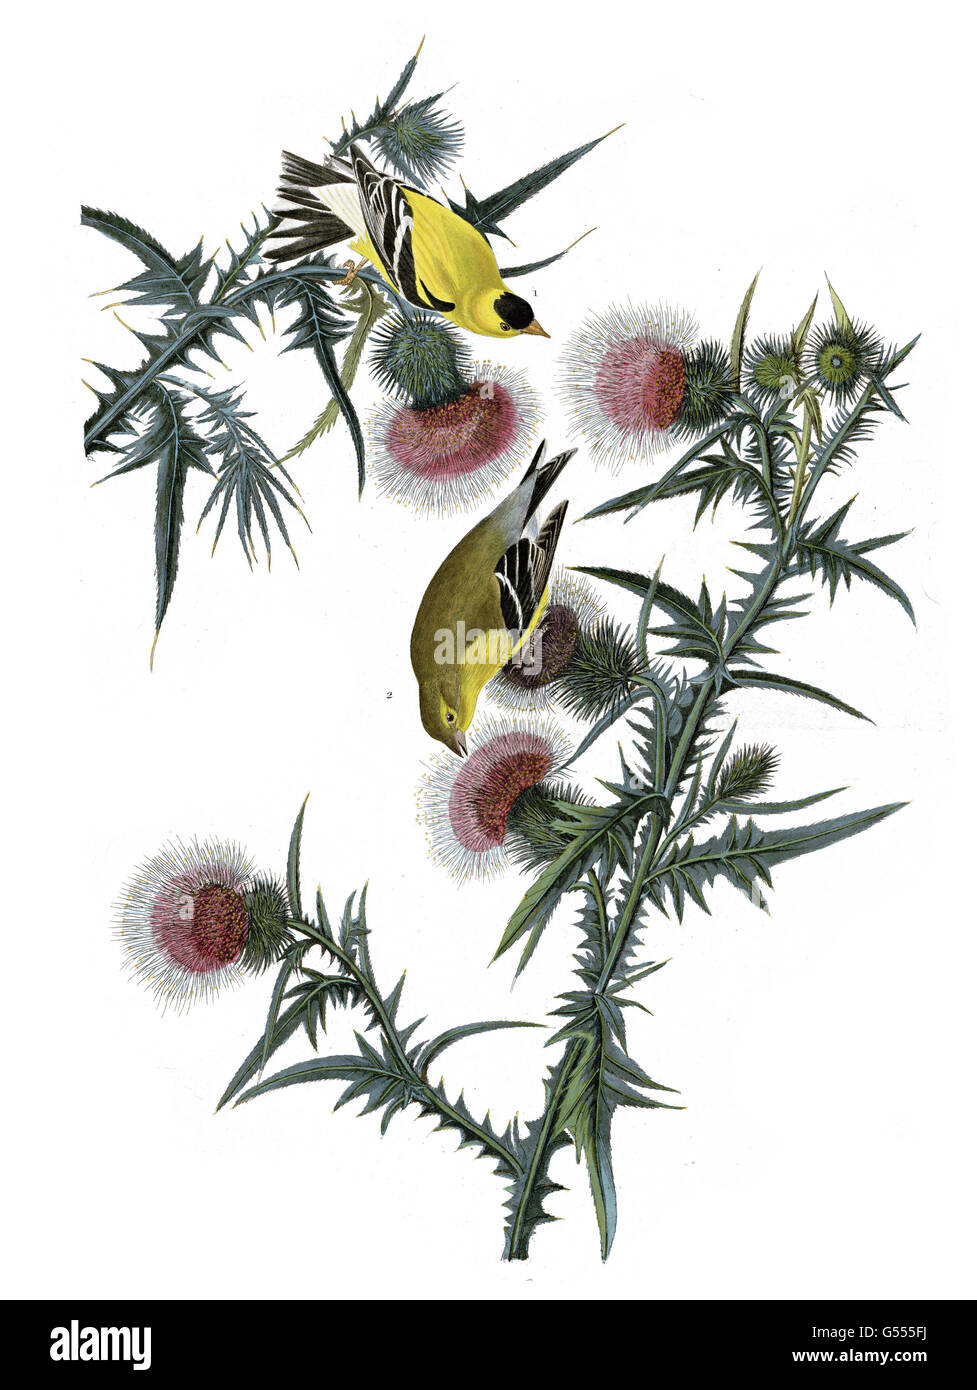 American Goldfinch, Carduelis tristis, birds, 1827 - 1838 - Stock Image